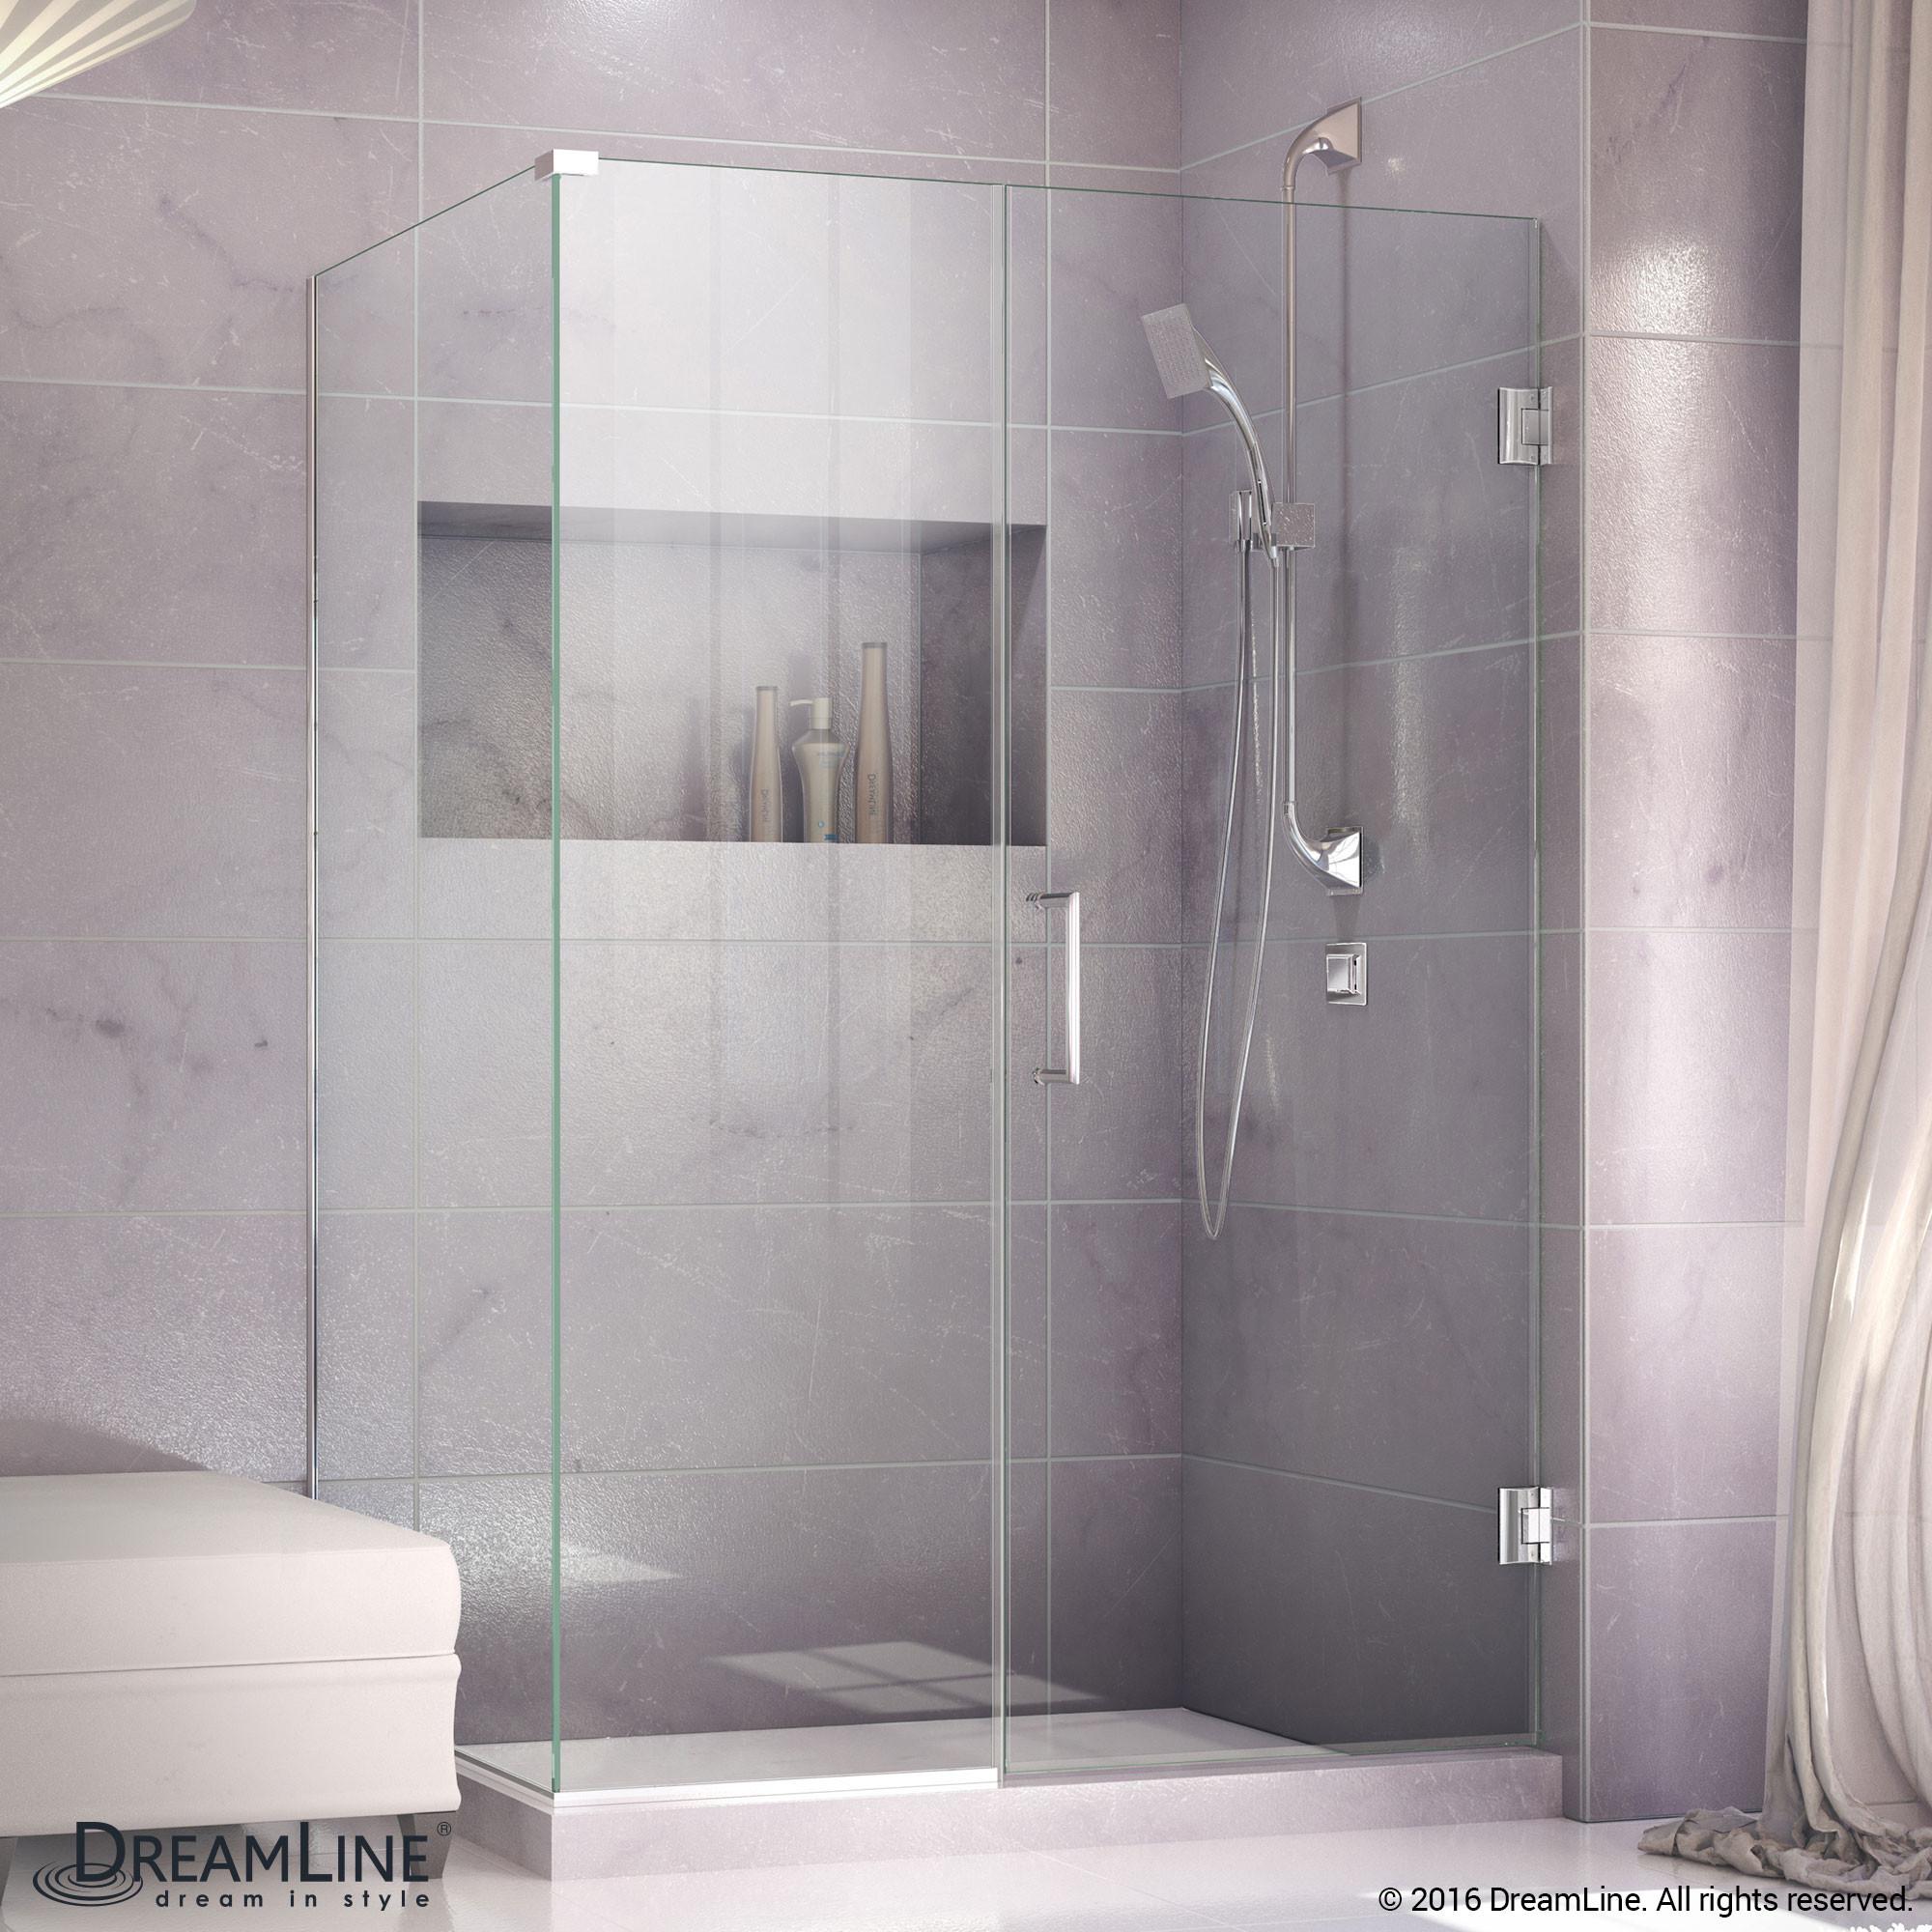 DreamLine SHEN-24450300-01 Unidoor Plus Hinged Shower Enclosure In Chrome Finish Hardware